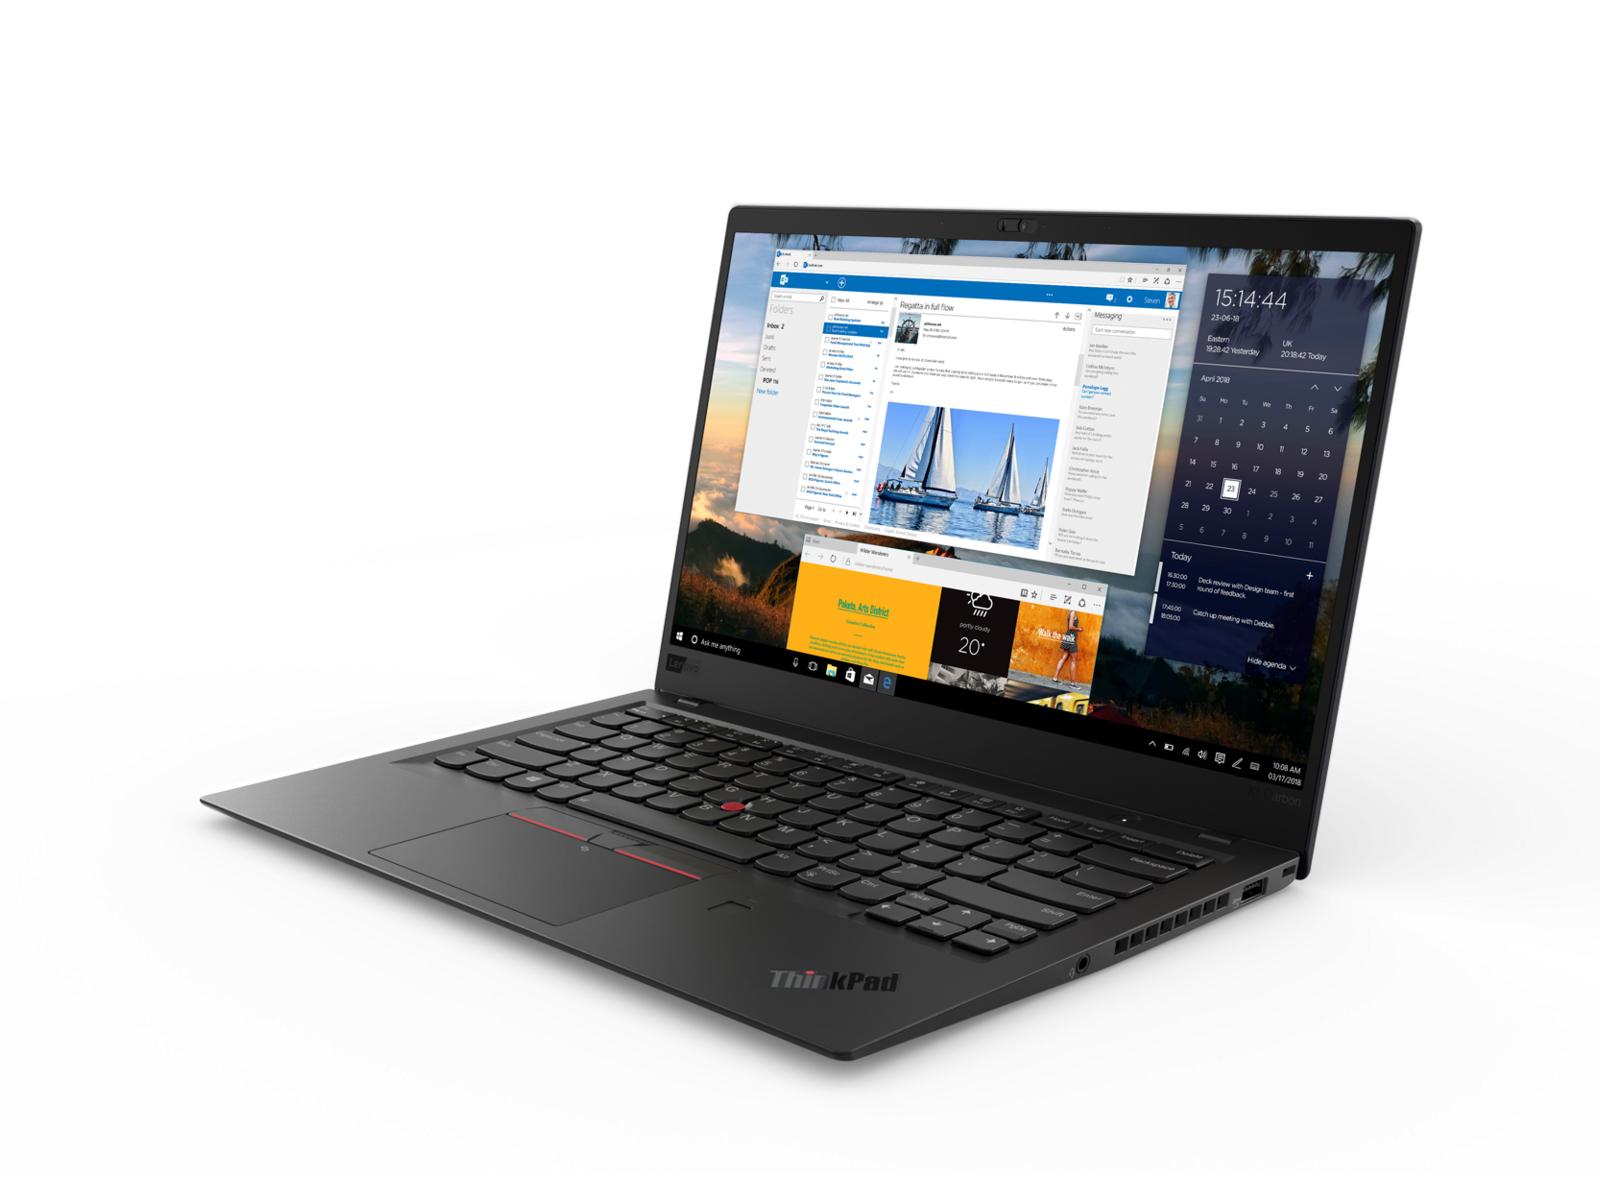 Lenovo ThinkPad X1 Carbon G6 [20KHS0C300] Intel i7-8550U/16GB/256GB SSD/14inchIPS FHD/4G LTE/HD620/Win10Pro64/3YrDP